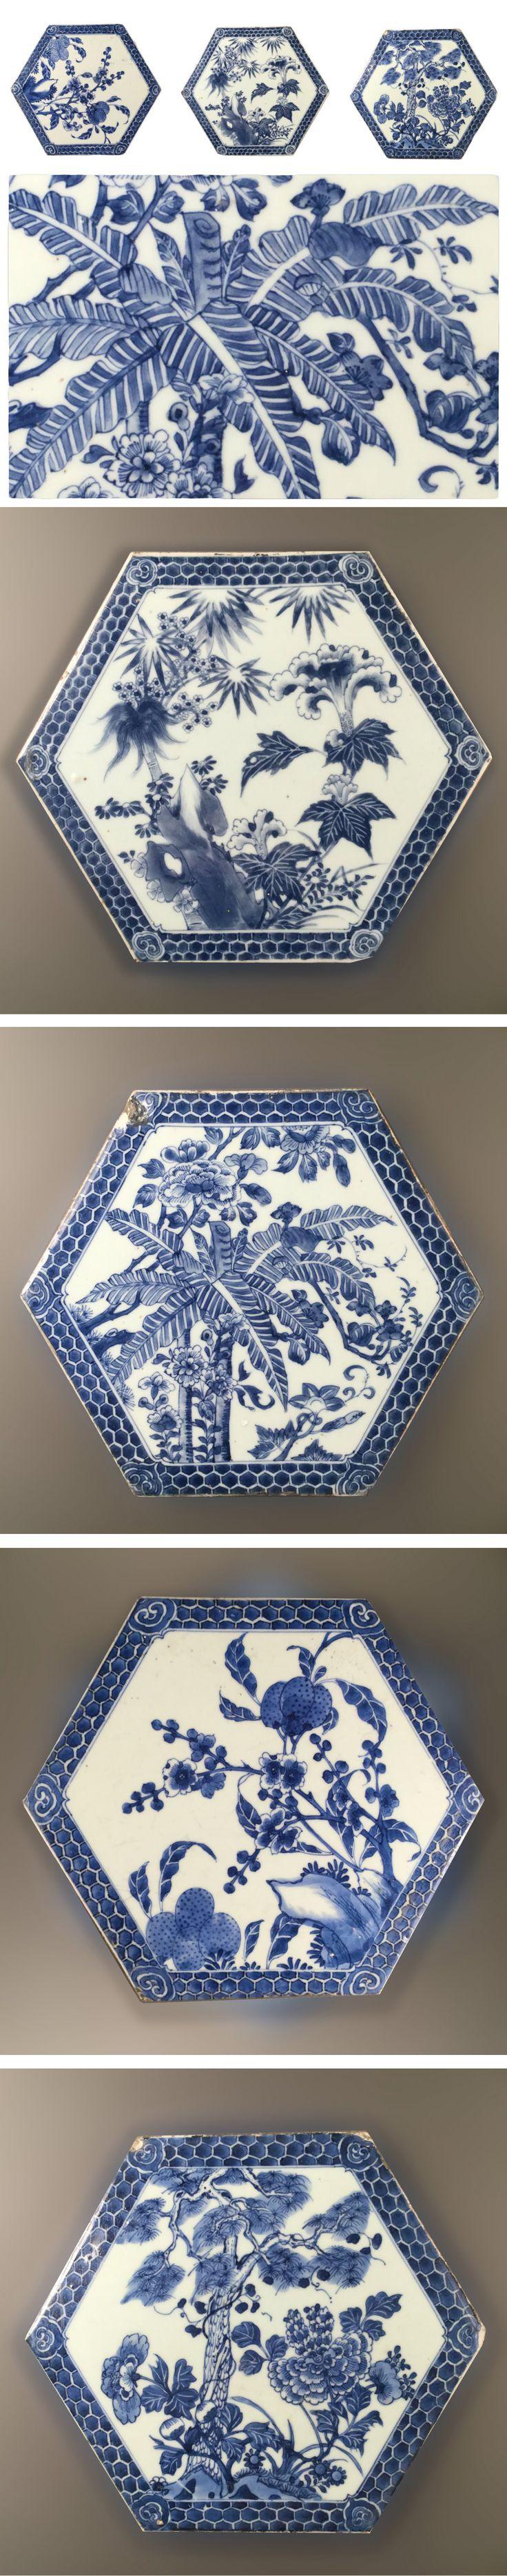 331 best decor: tiles and tilework images on pinterest | tiles